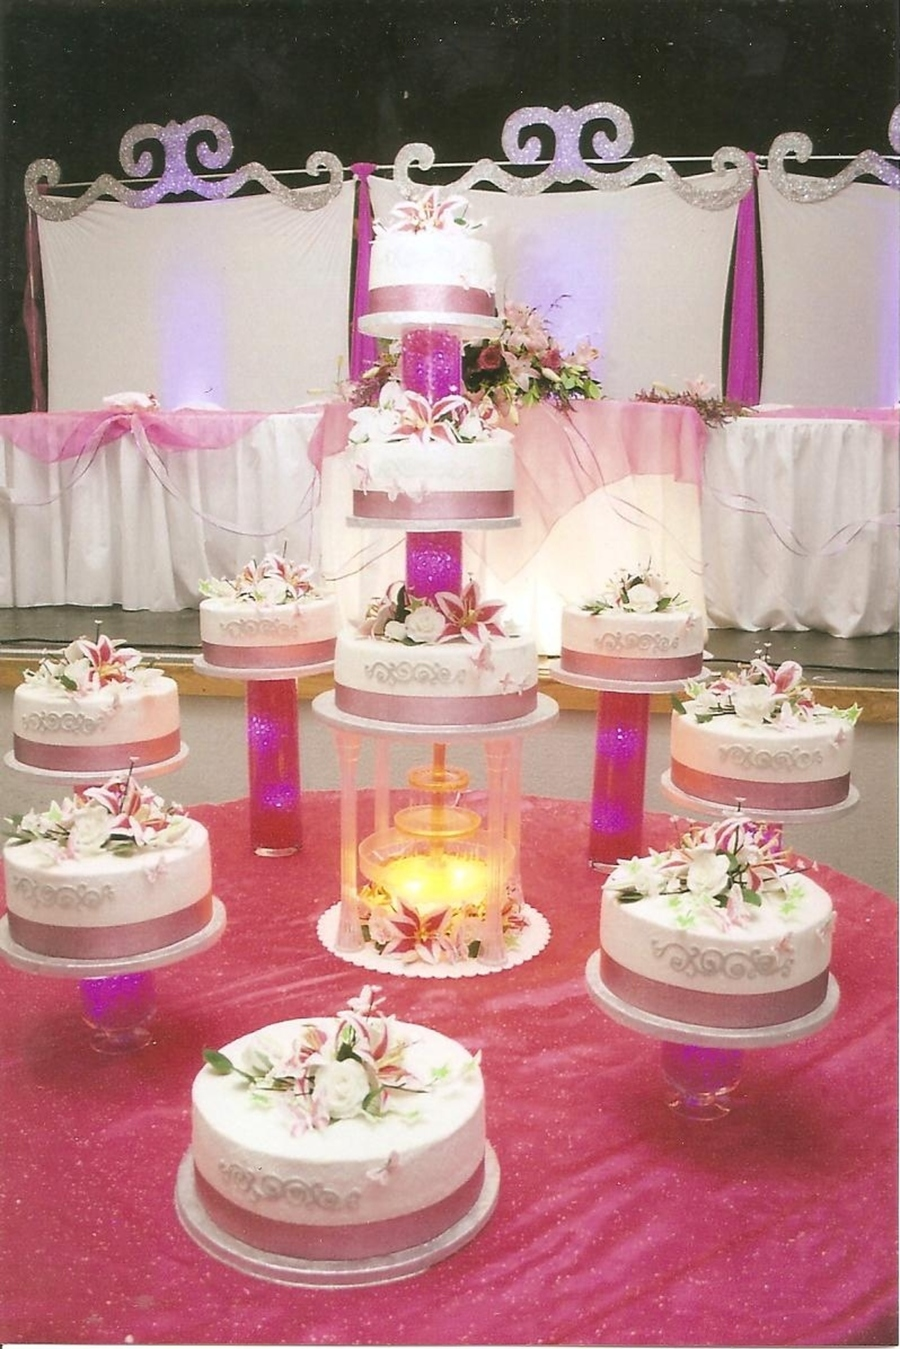 Spanish Wedding Cake Recipe